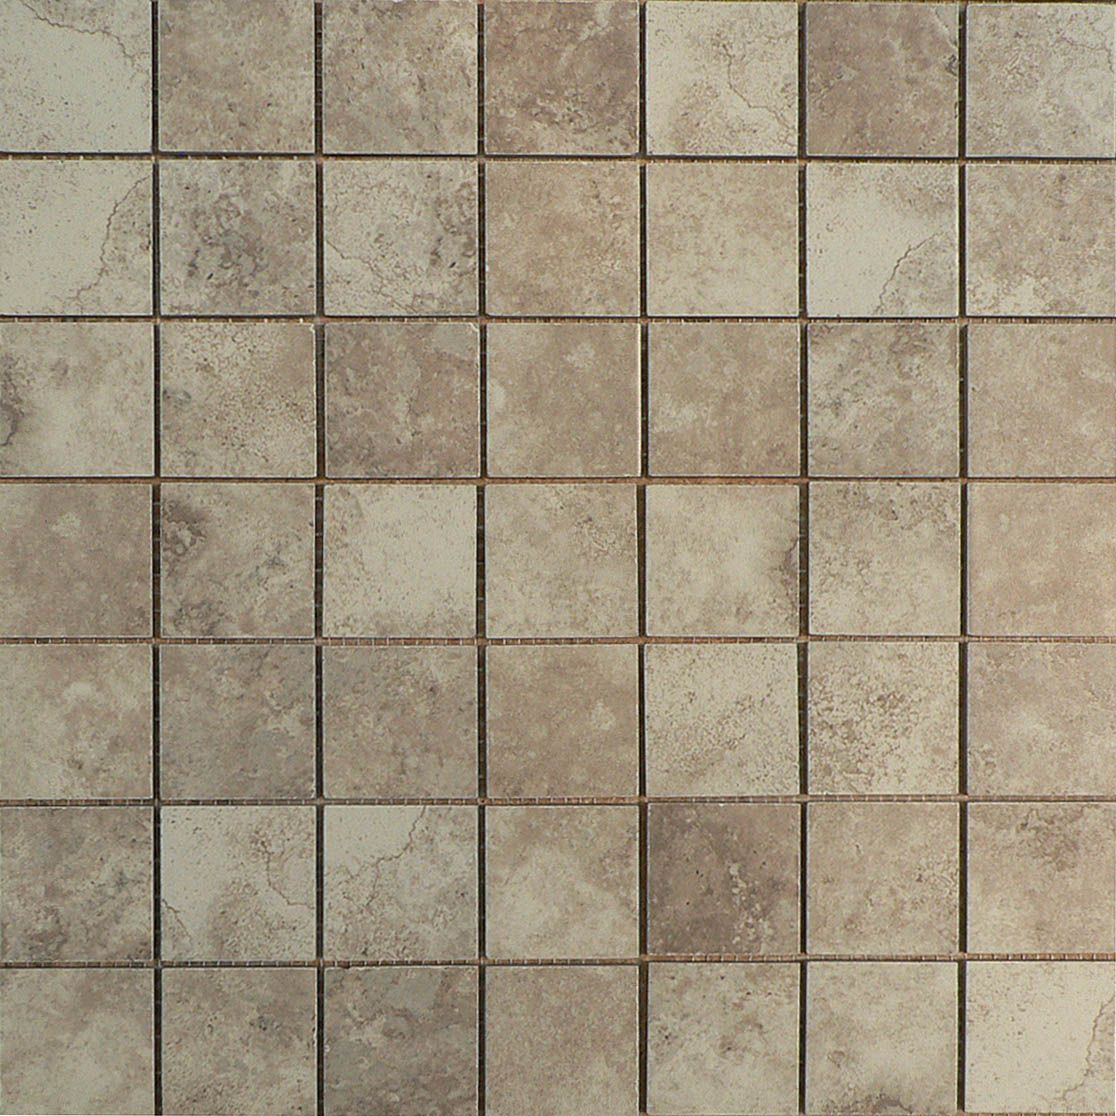 ceramic floors - Buscar con Google | Floors | Pinterest | Floor ...